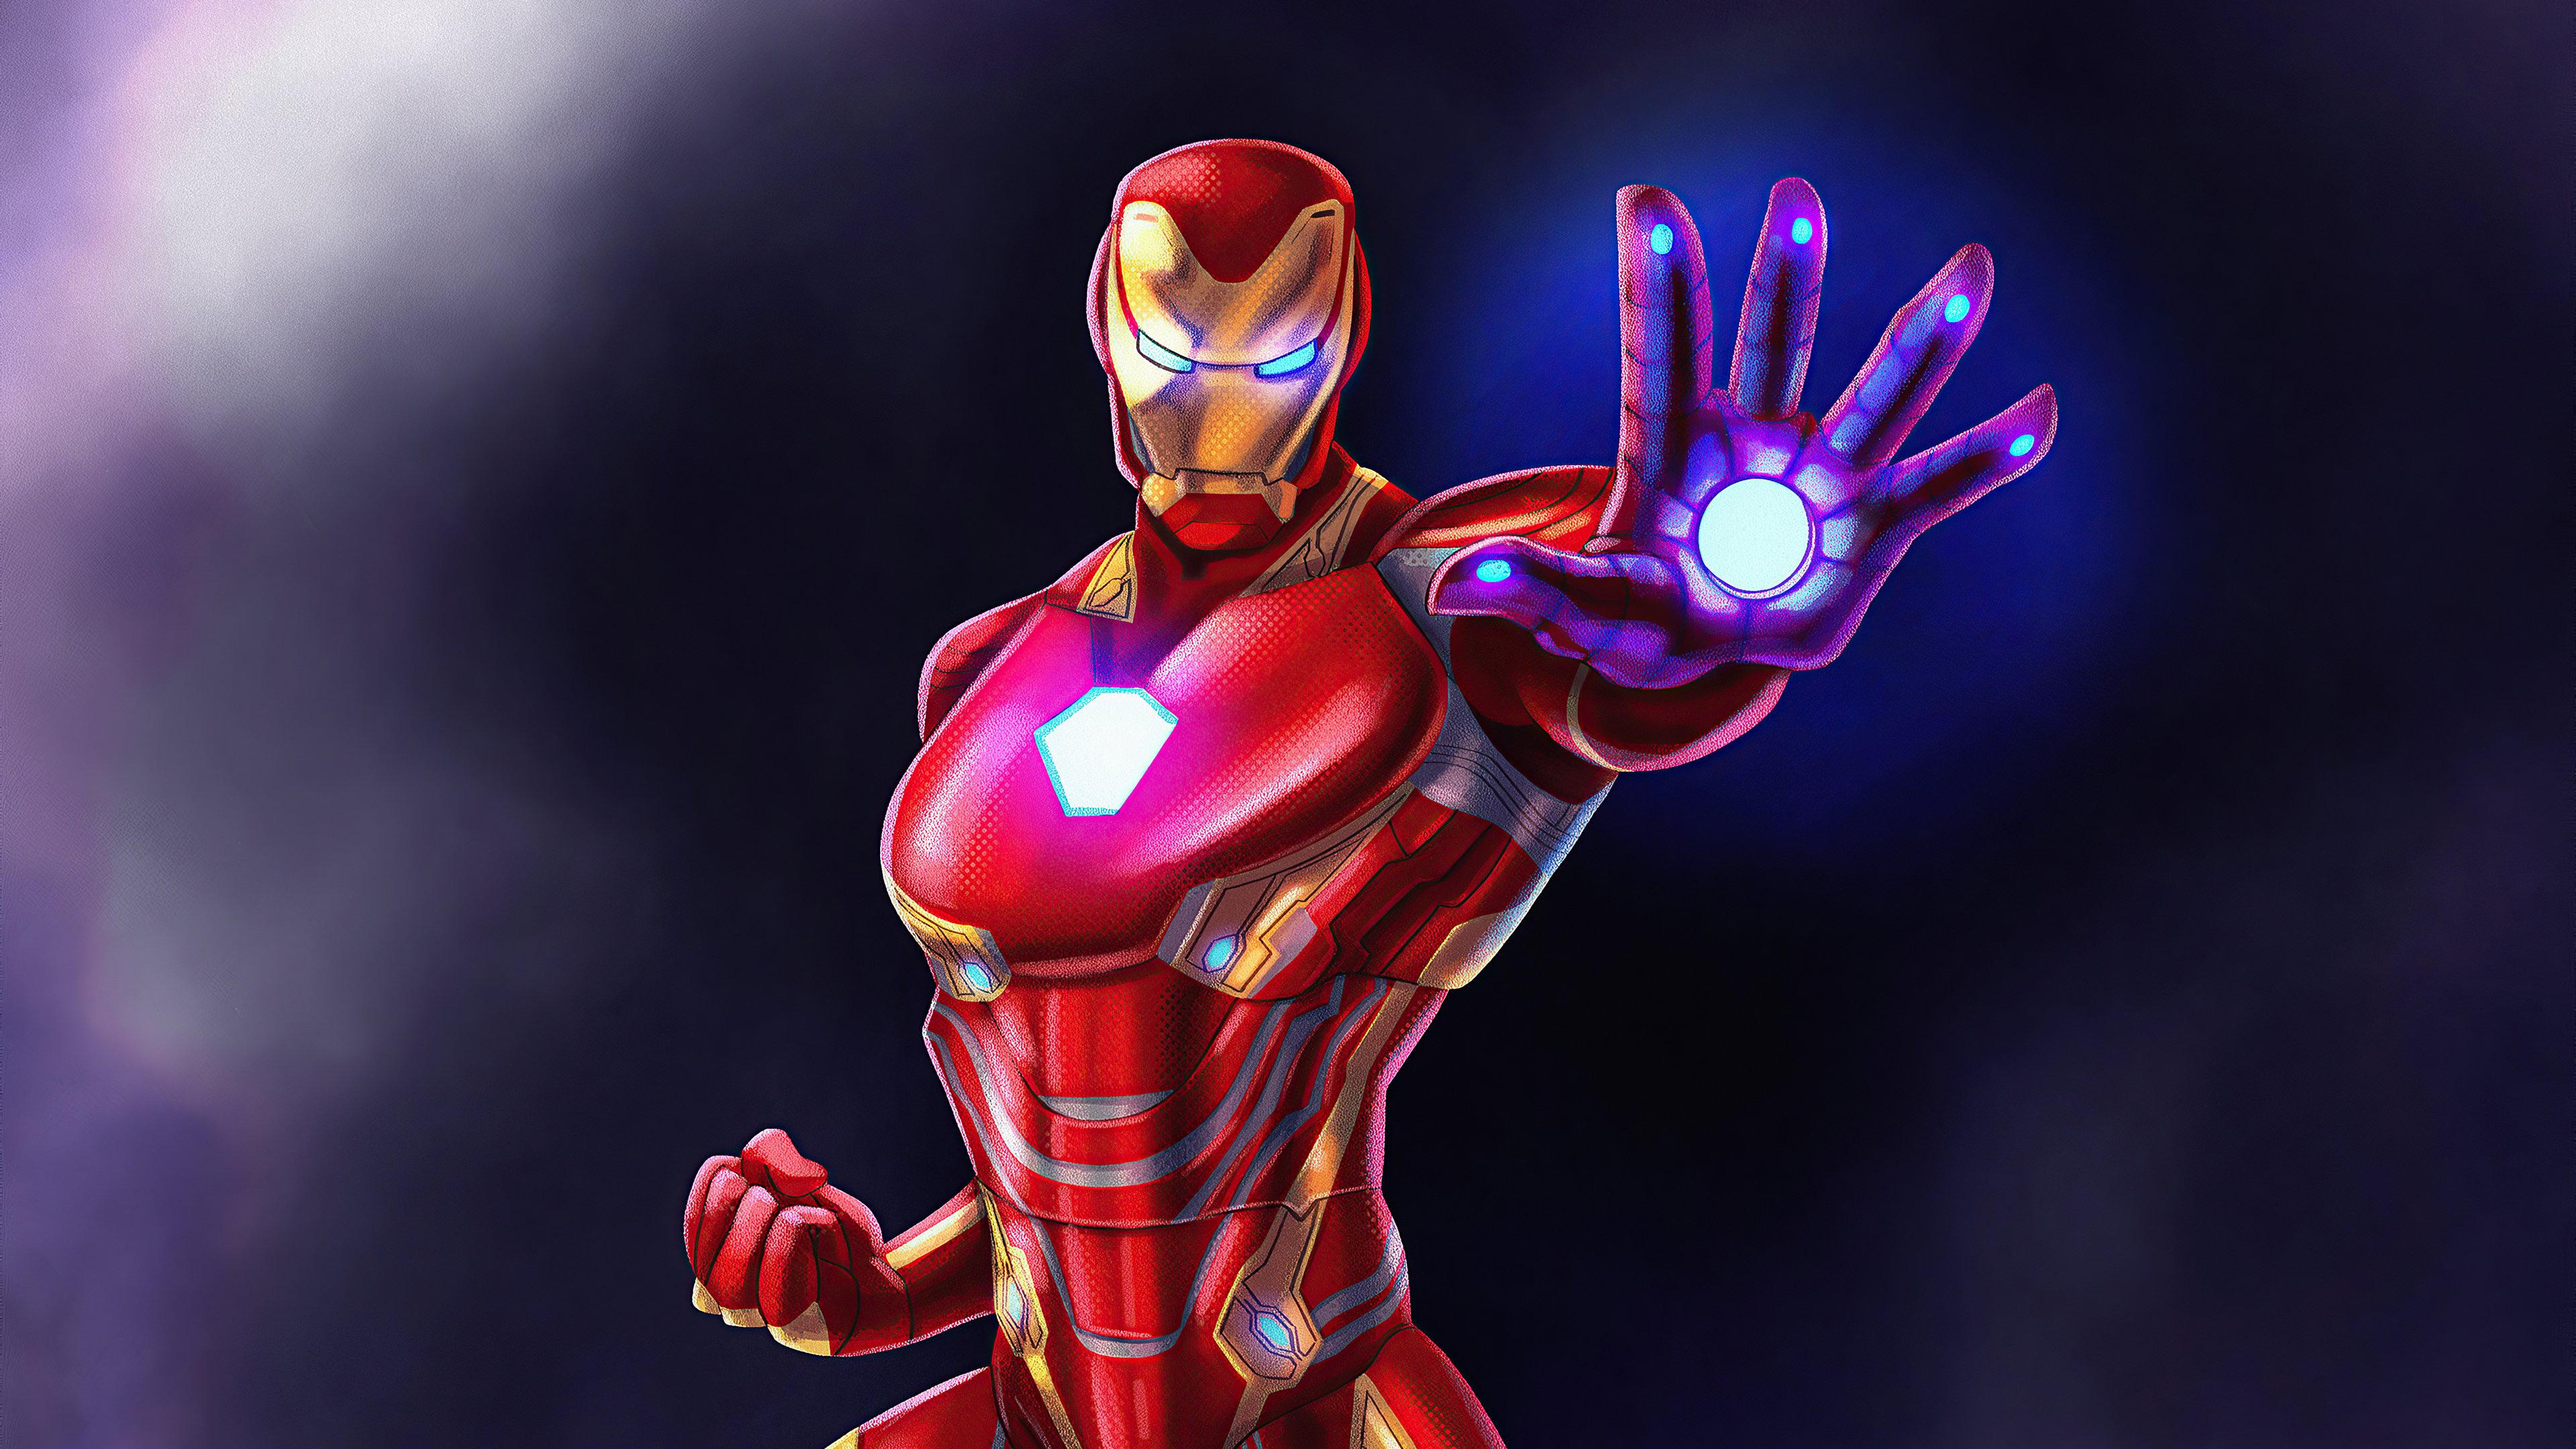 Fondos de pantalla Iron Man Fanart 2020